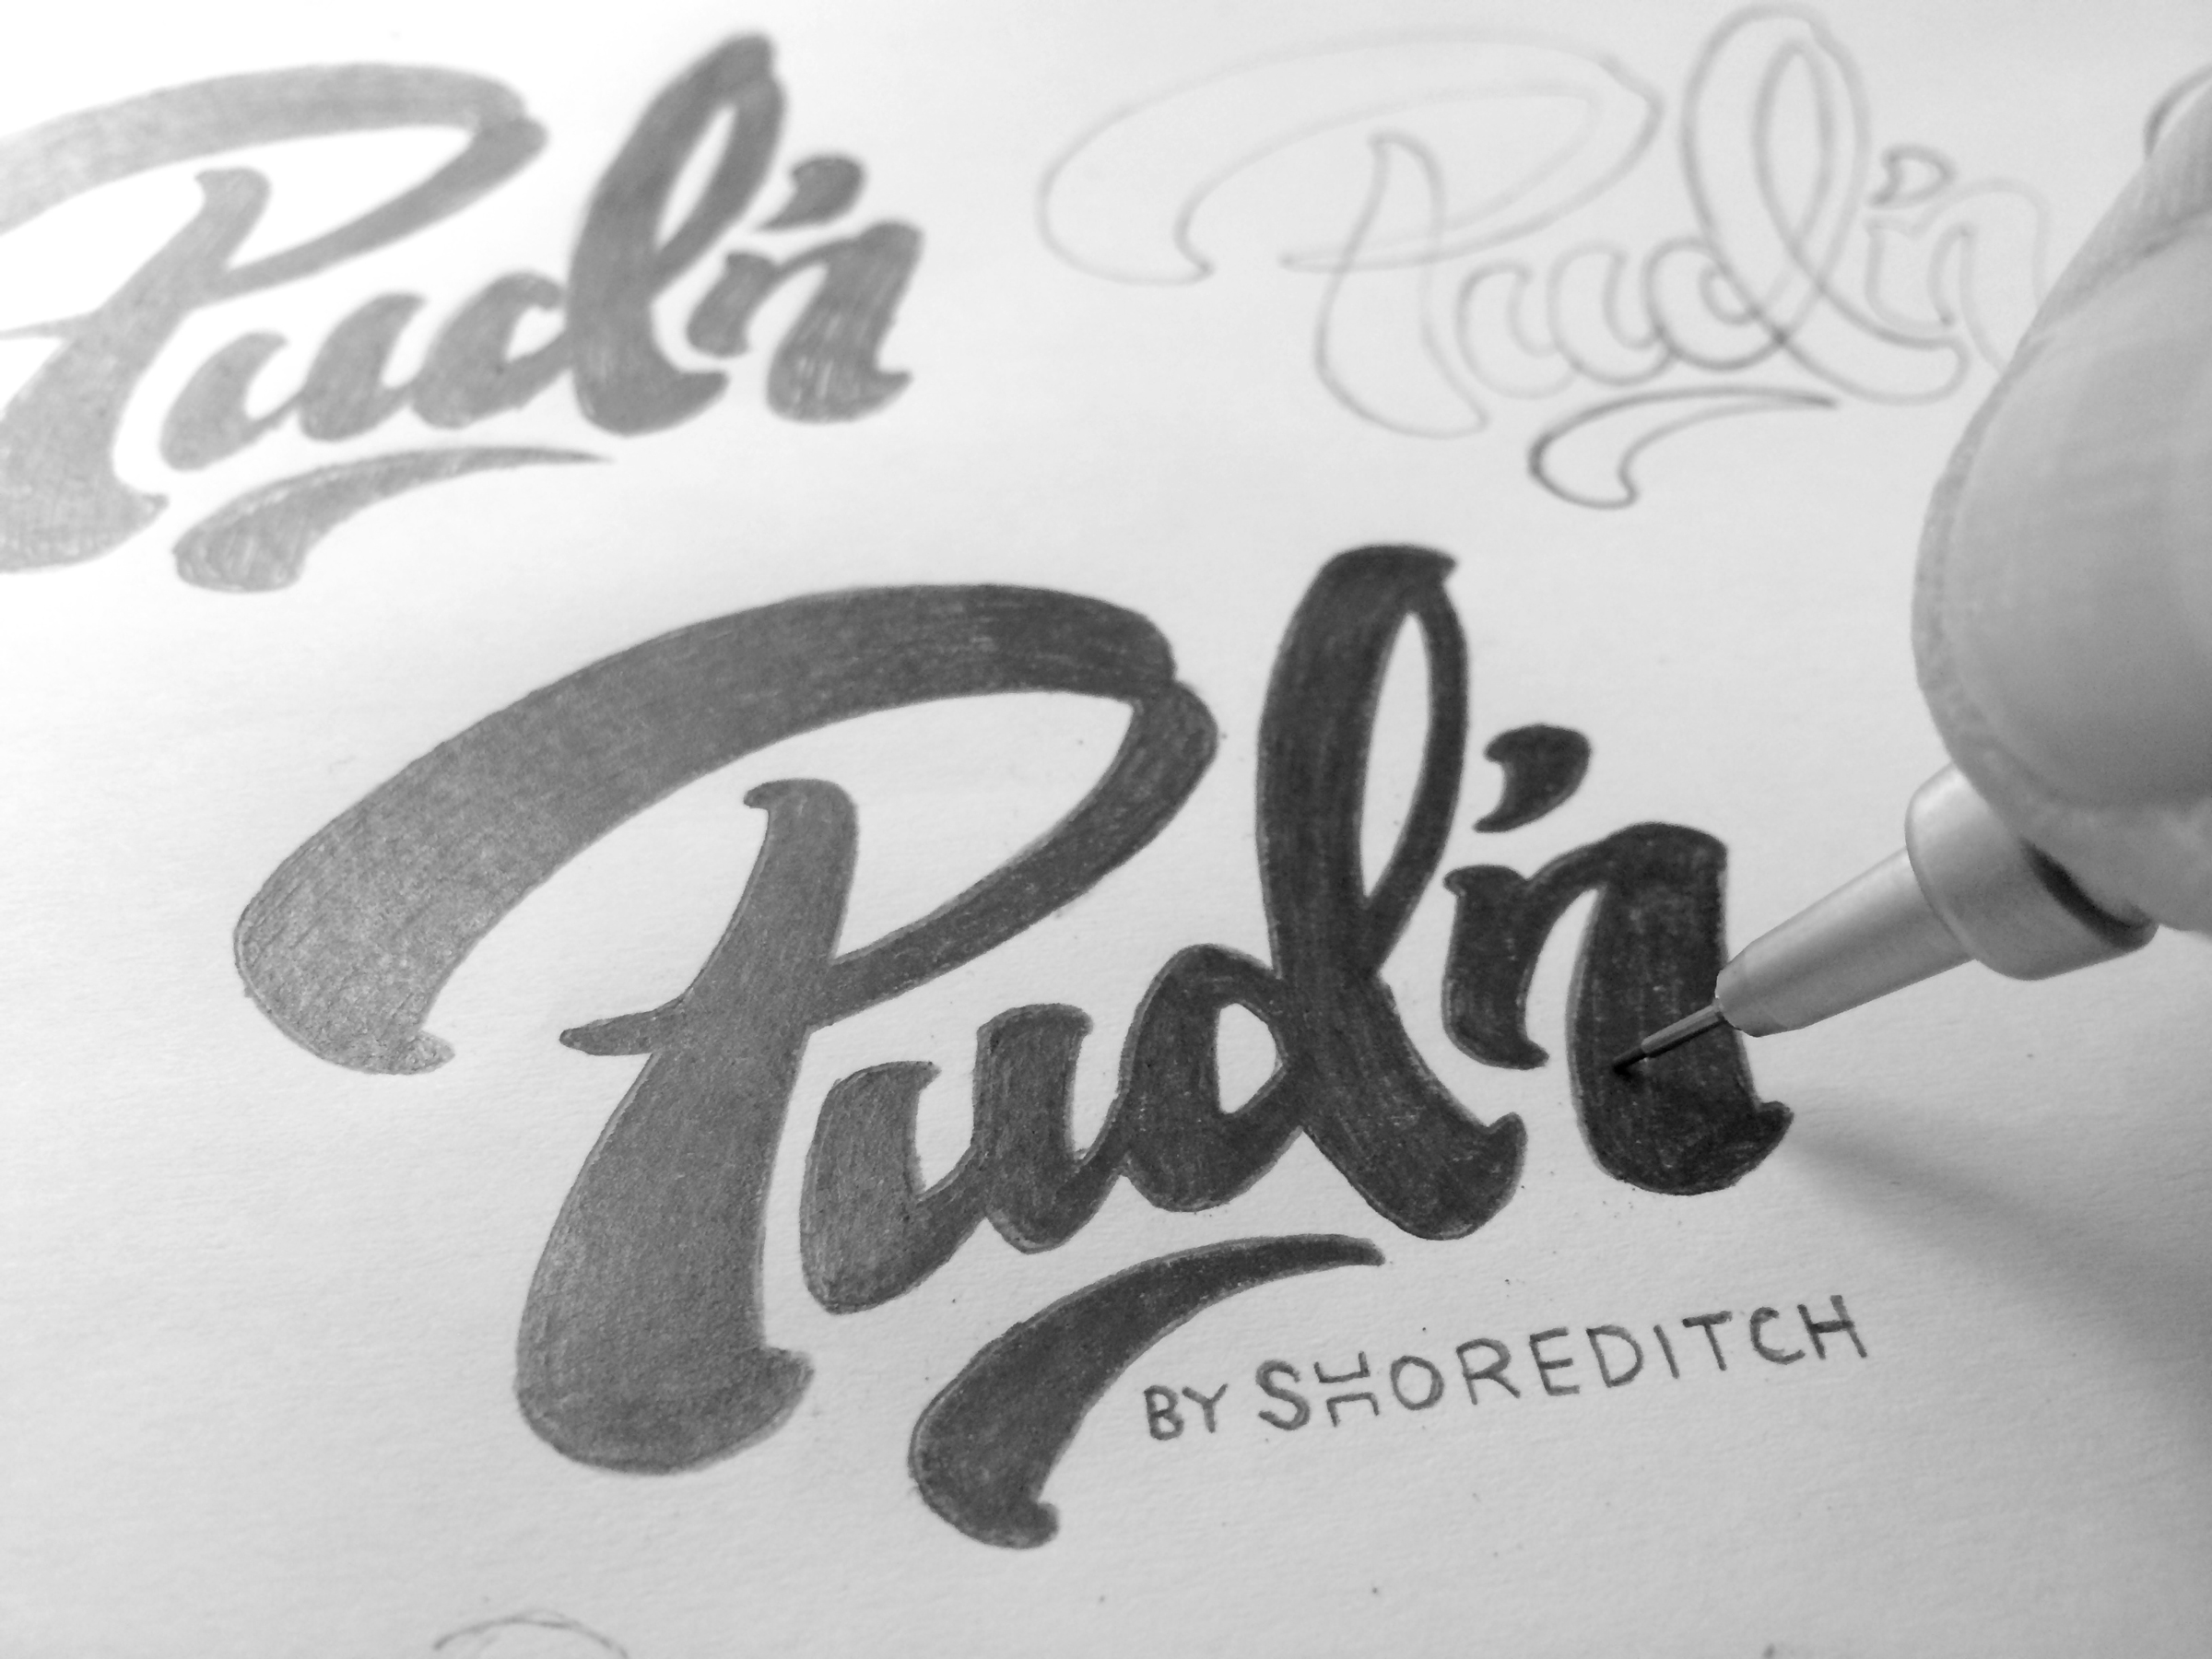 Shoreditch_Pudn_03.jpg